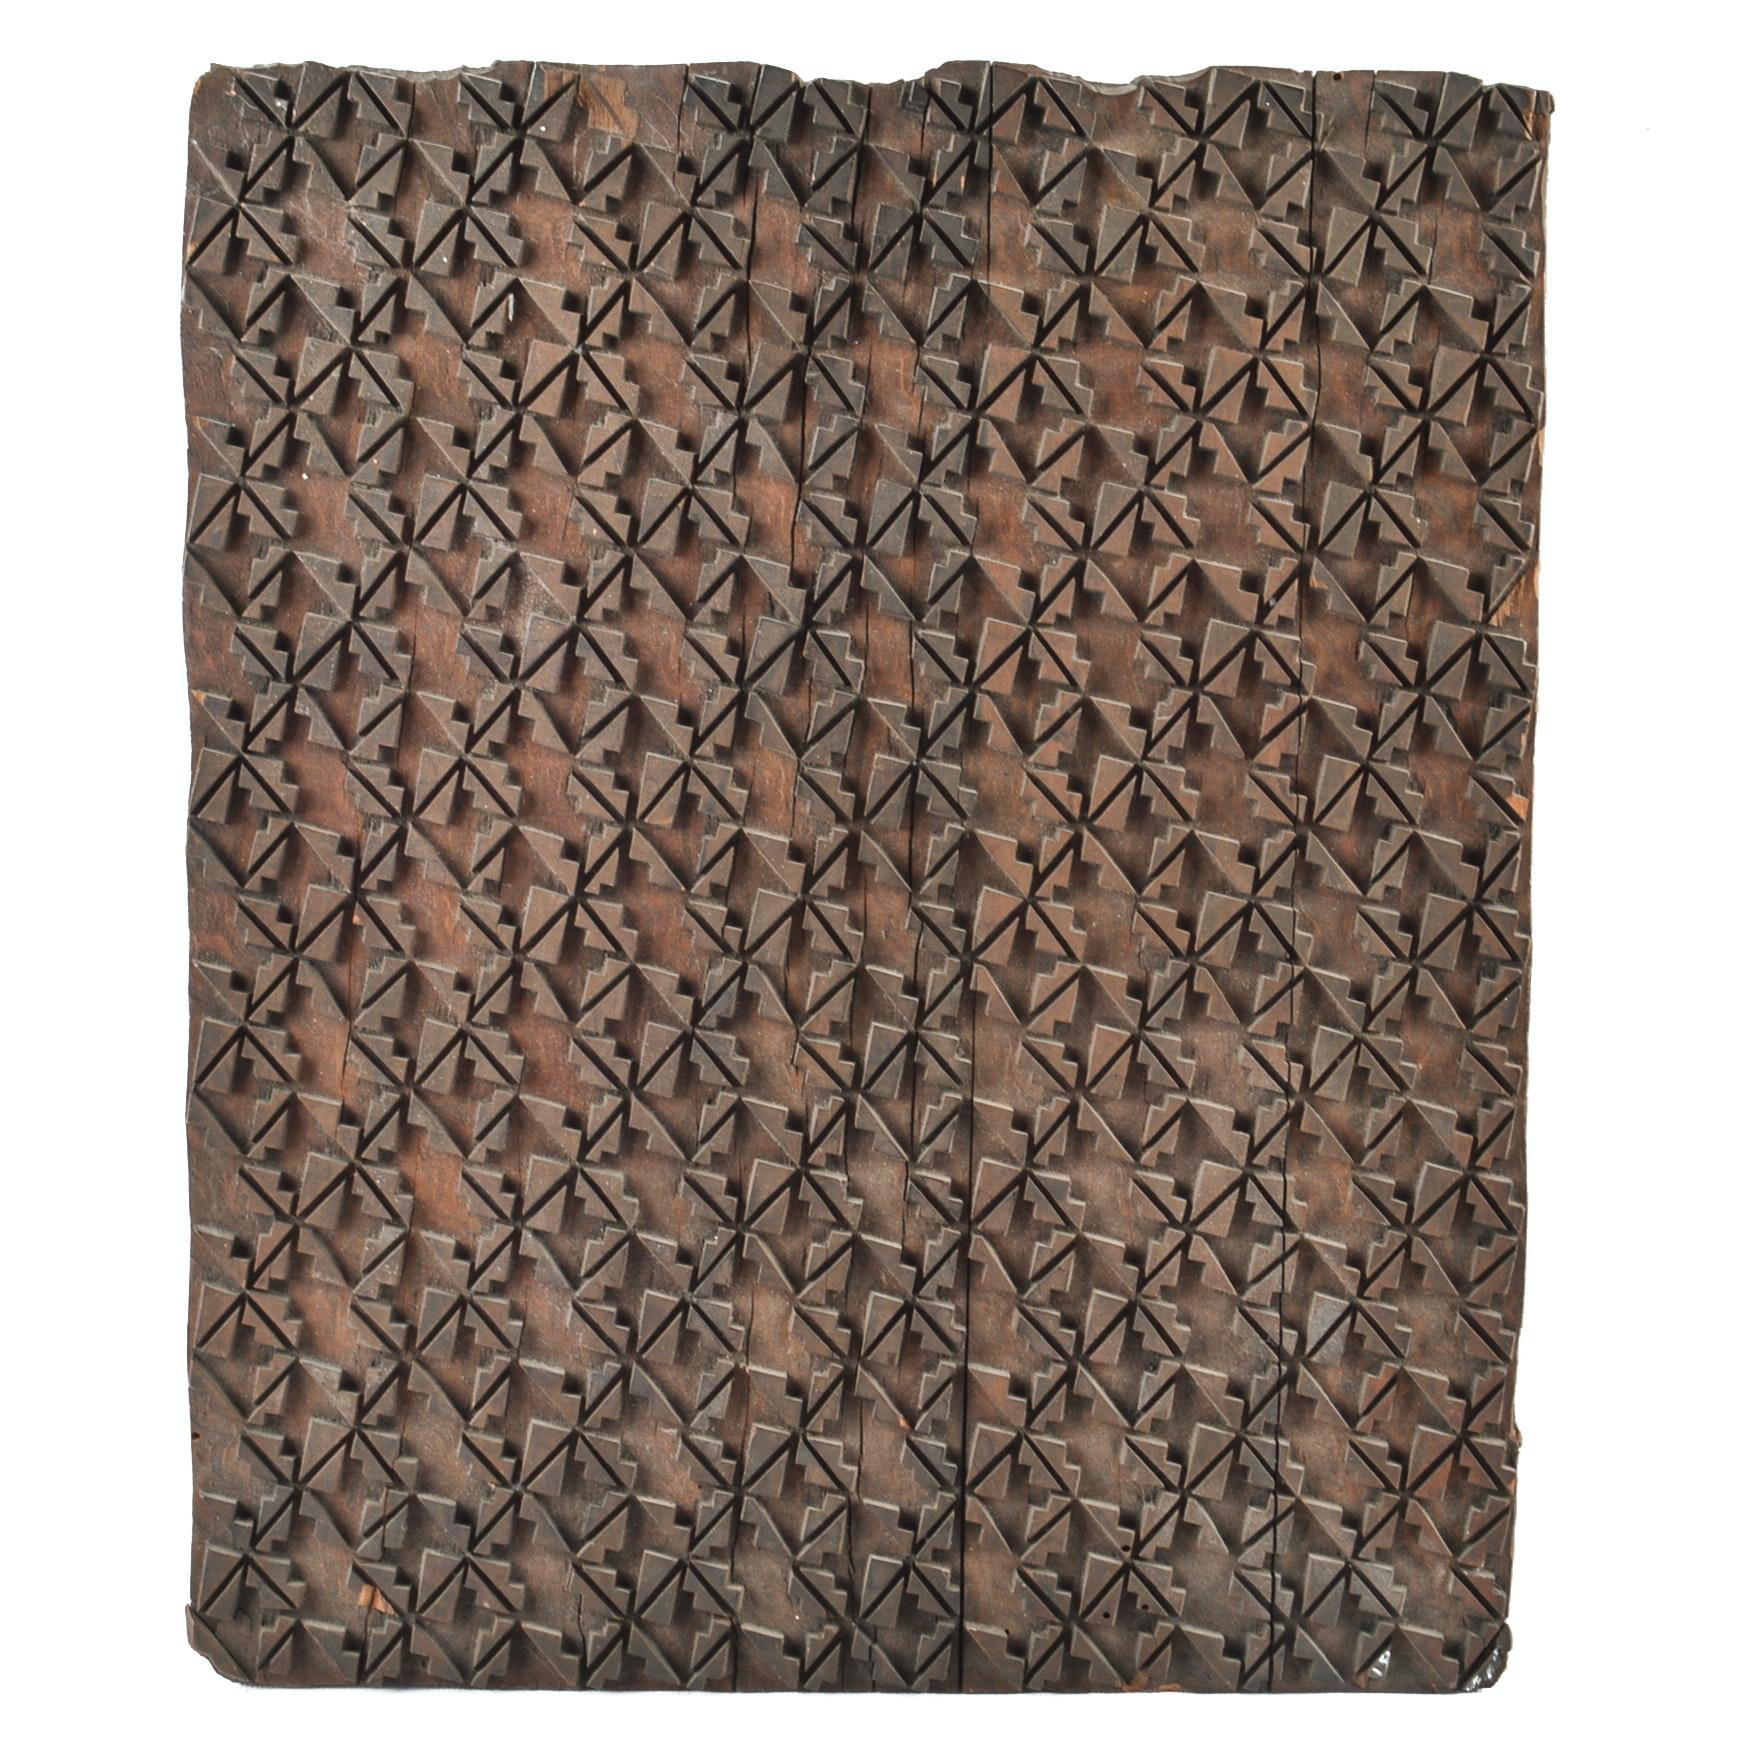 Antique to Vintage Textile Printing Block